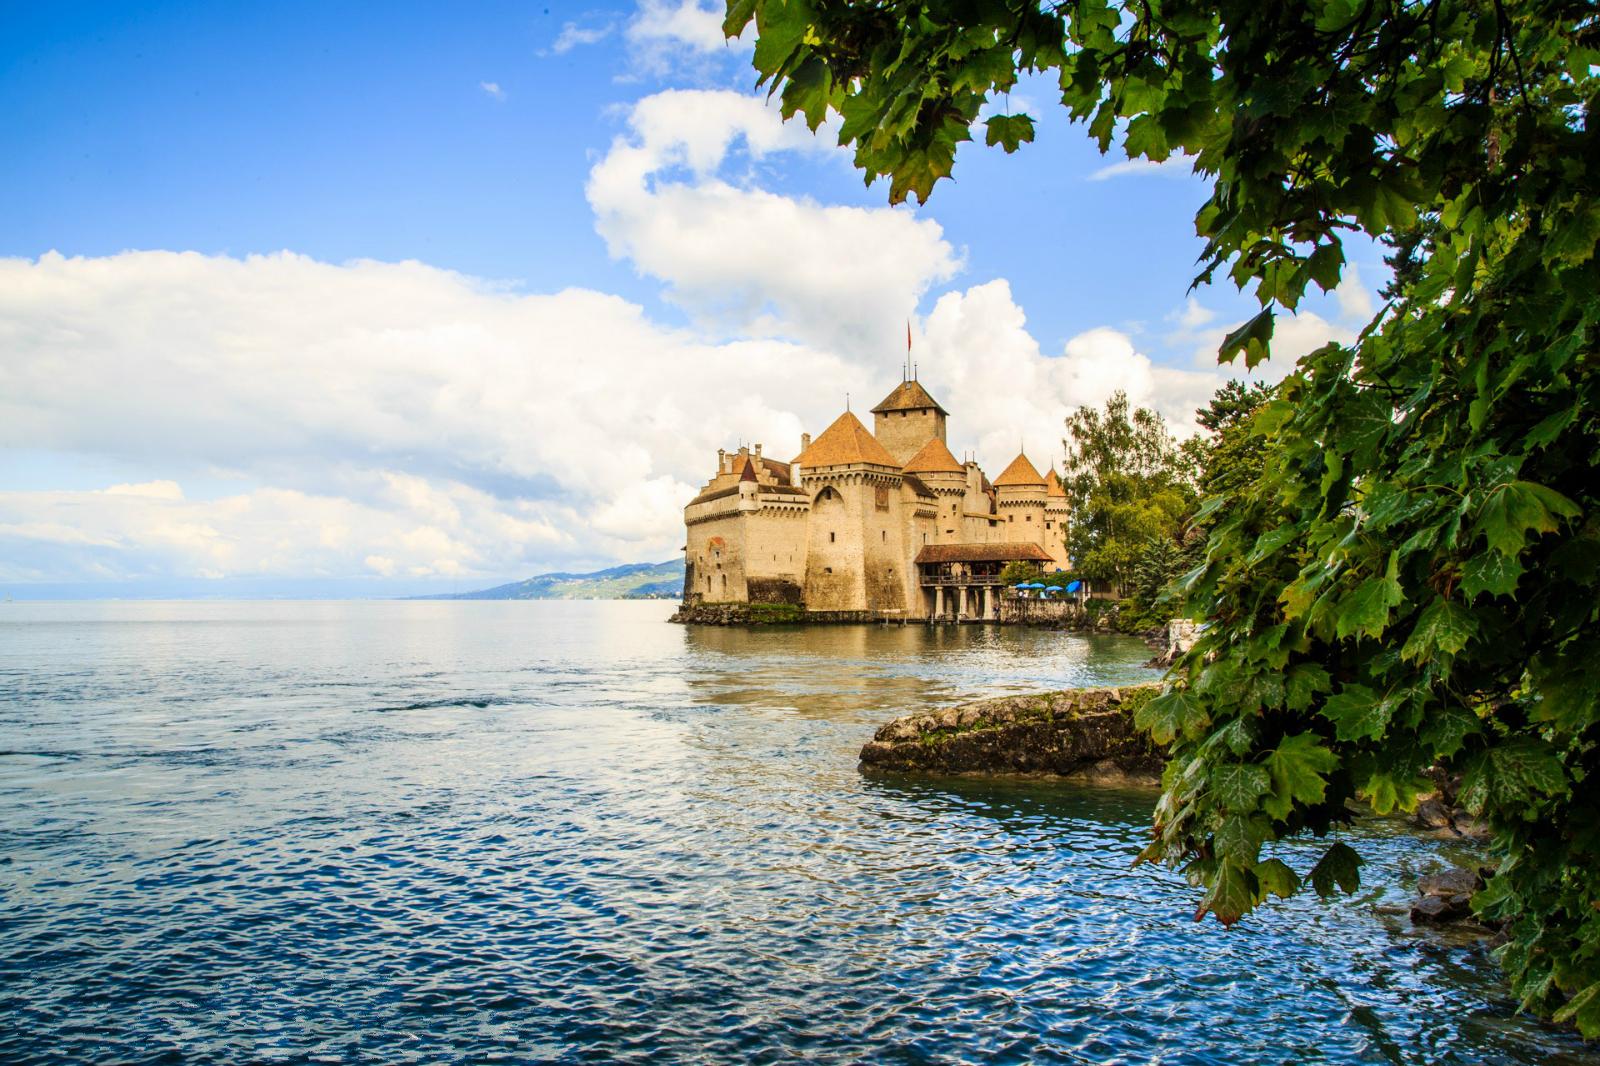 Annemasse - 洛桑(Lausanne) - 西庸城堡(chateau de chillon)- 伯恩(Berne)- 因特拉肯(Interlaken)